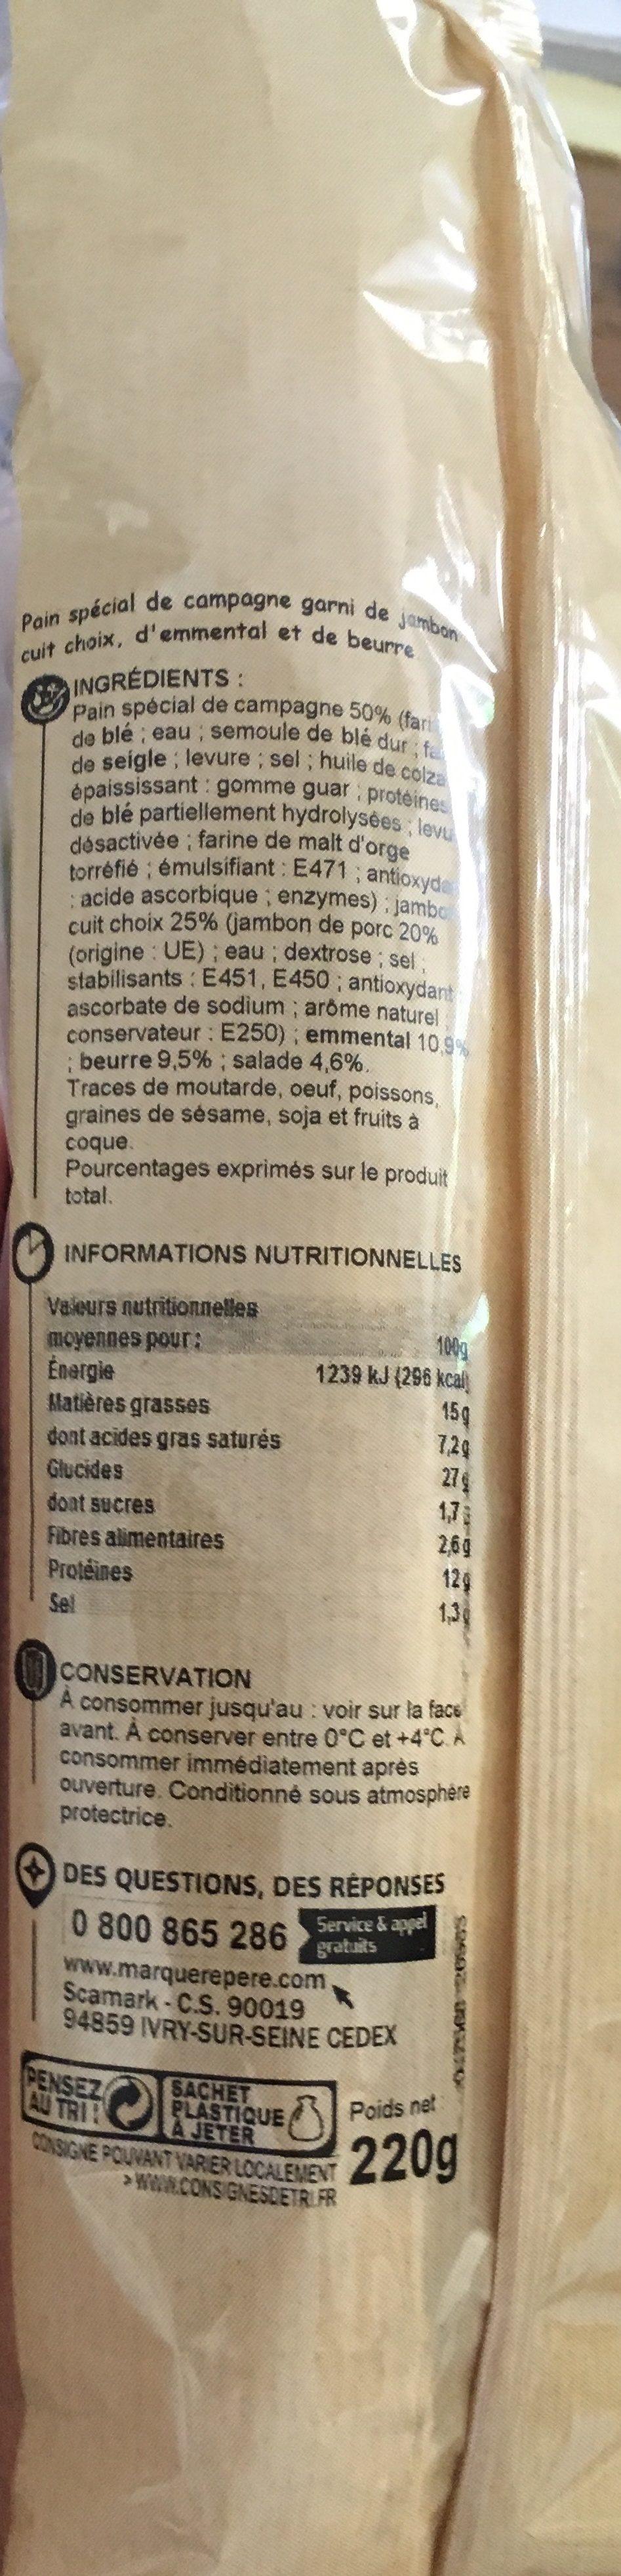 Sandwich baguette de campagne jambon emmental salade - Ingrédients - fr